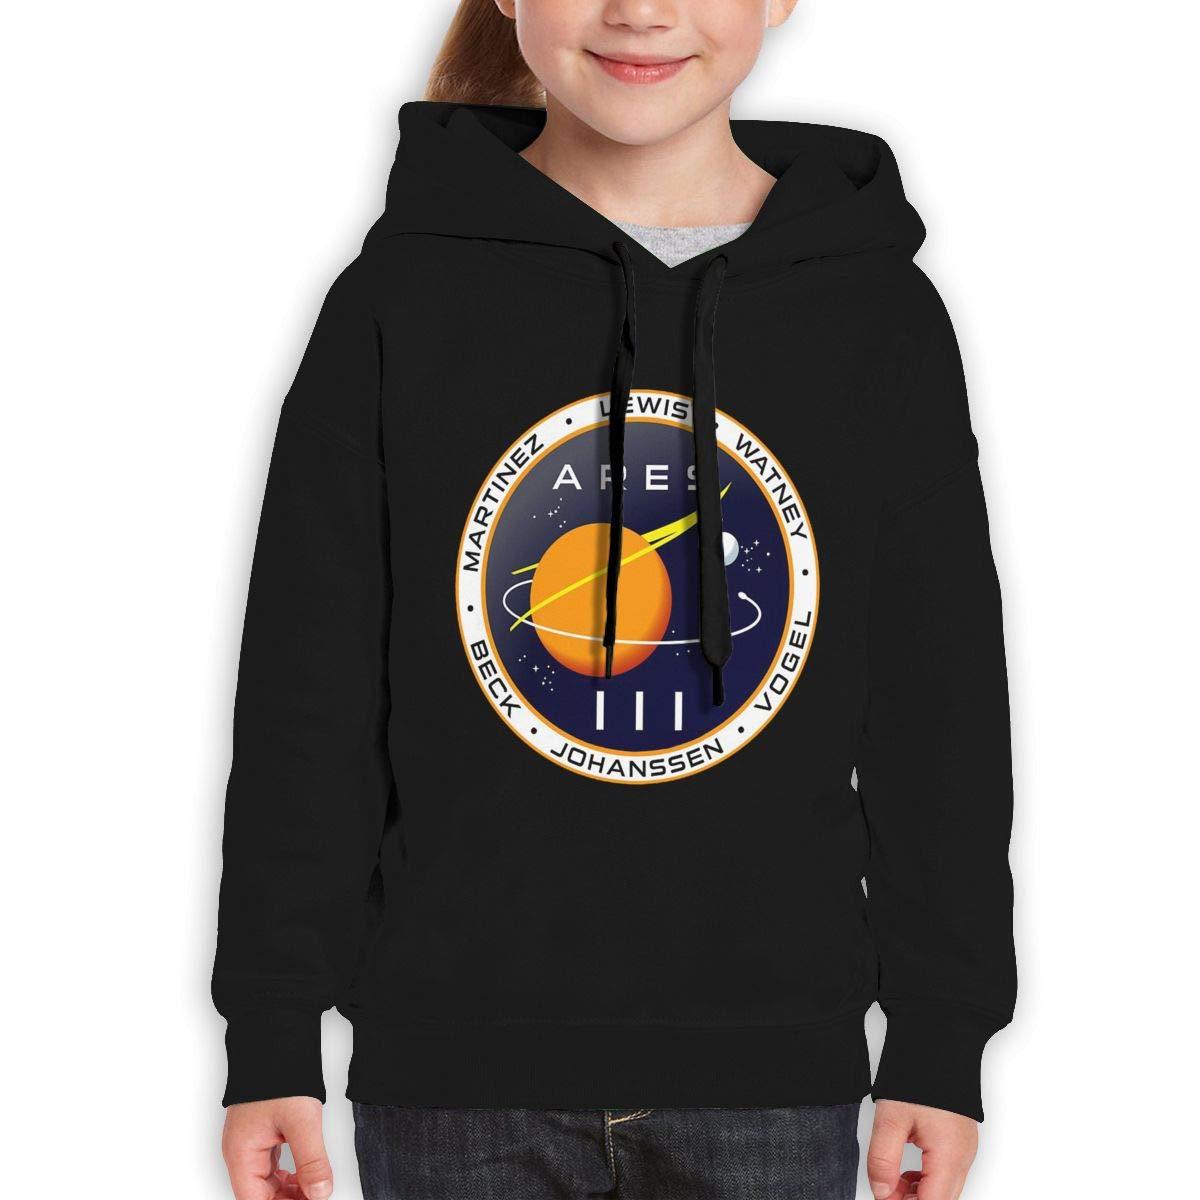 MUPTQWIU Teen Girls Mission to Mars The Martian Leisure Running Black Hoodies